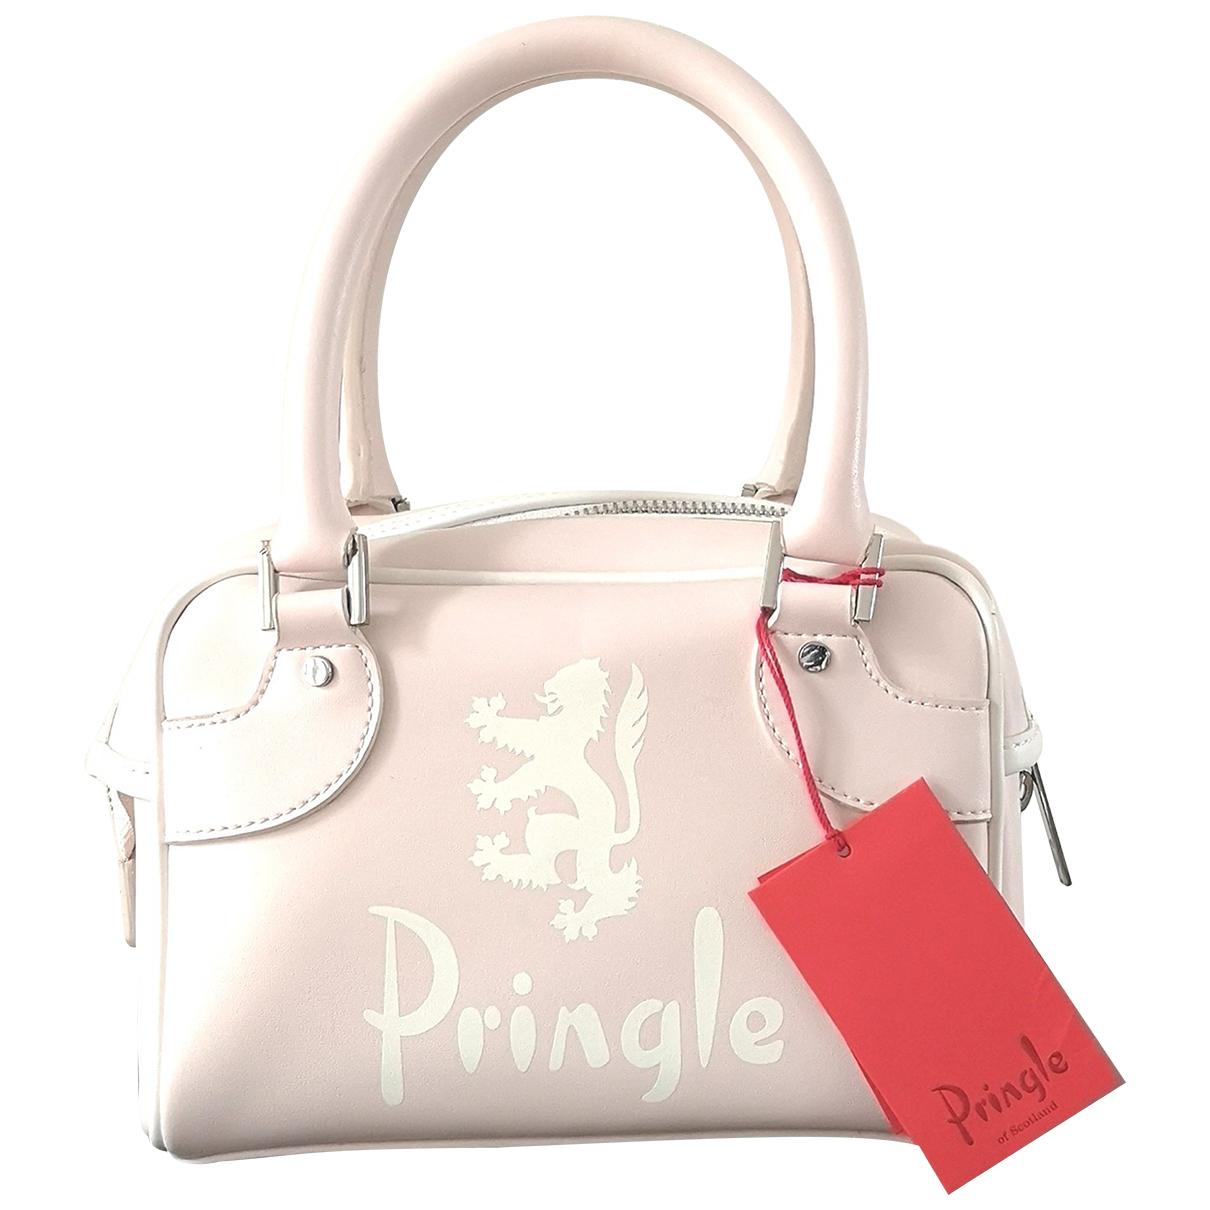 Pringle Of Scotland N Pink Patent leather handbag for Women N